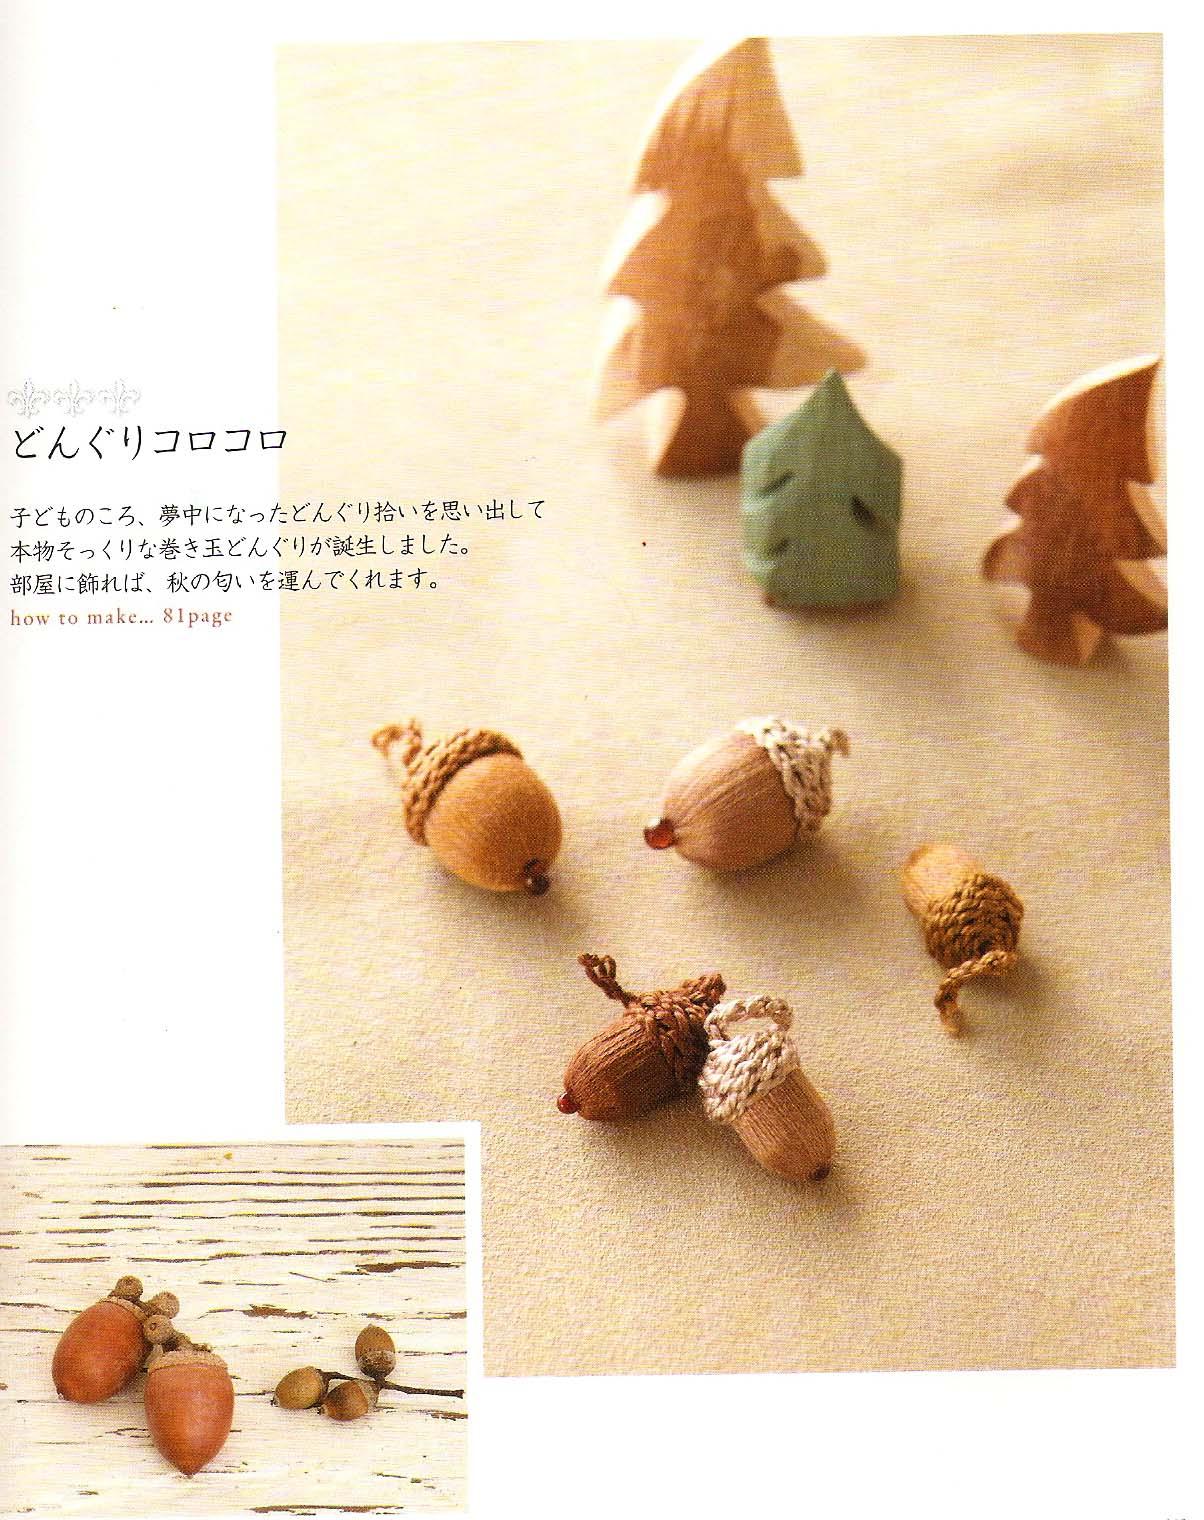 Zakka Life Japanese Craft Book For Making Tassels